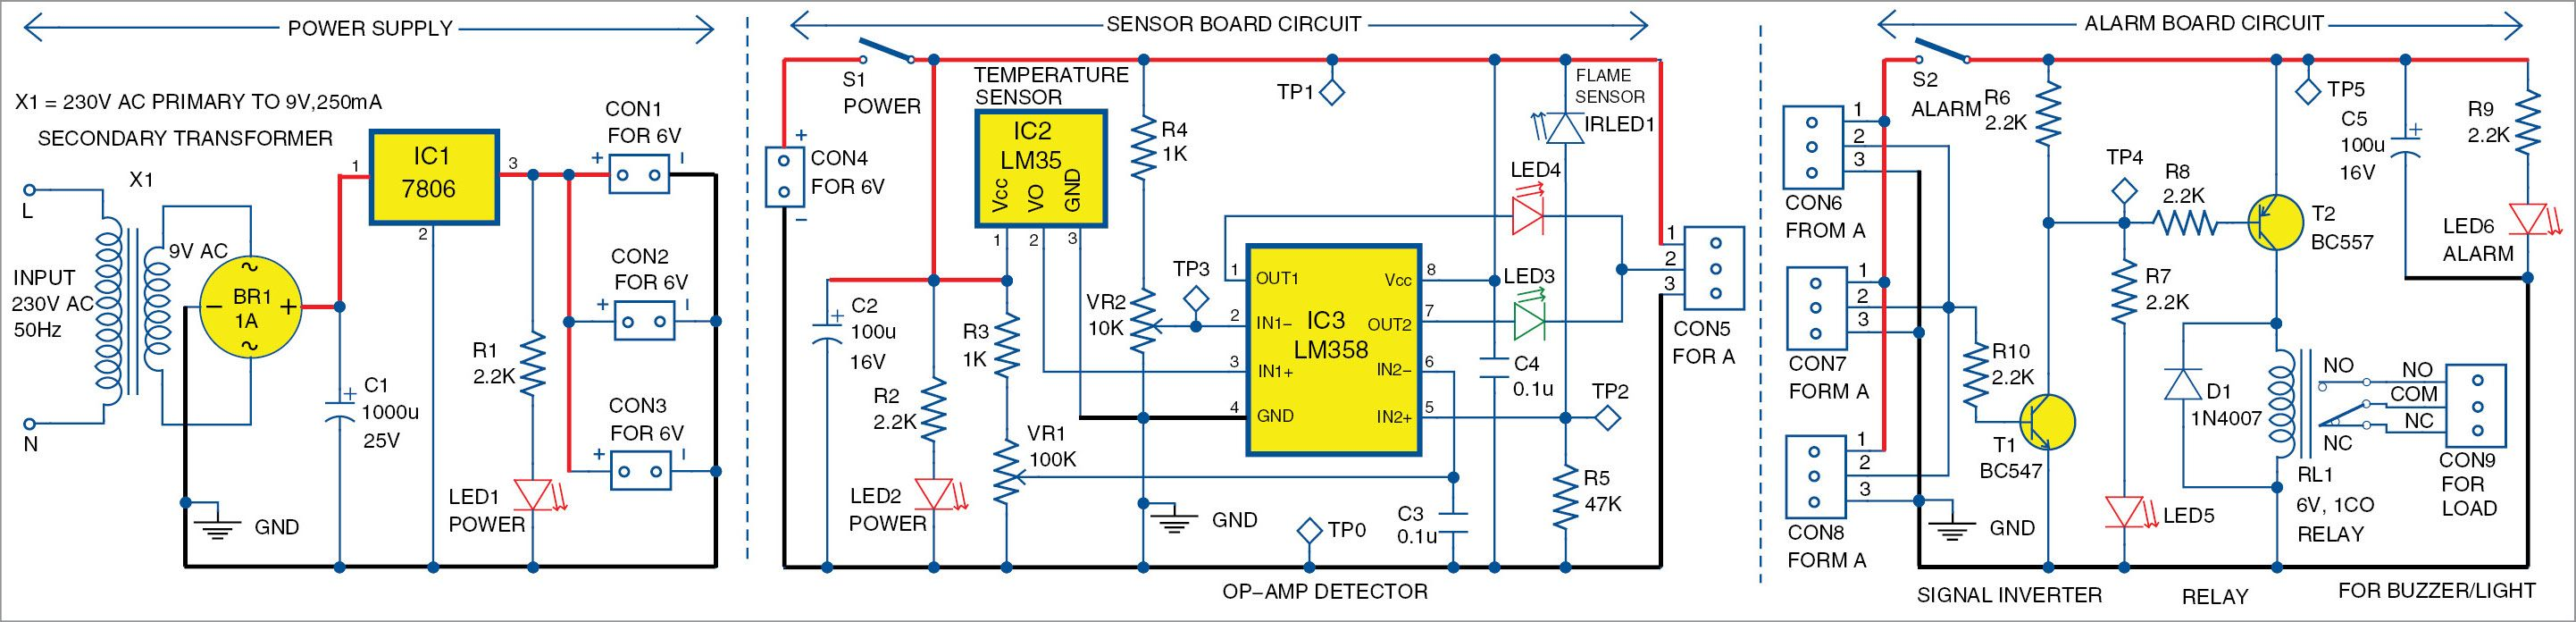 hight resolution of simple multi sensor fire alarm